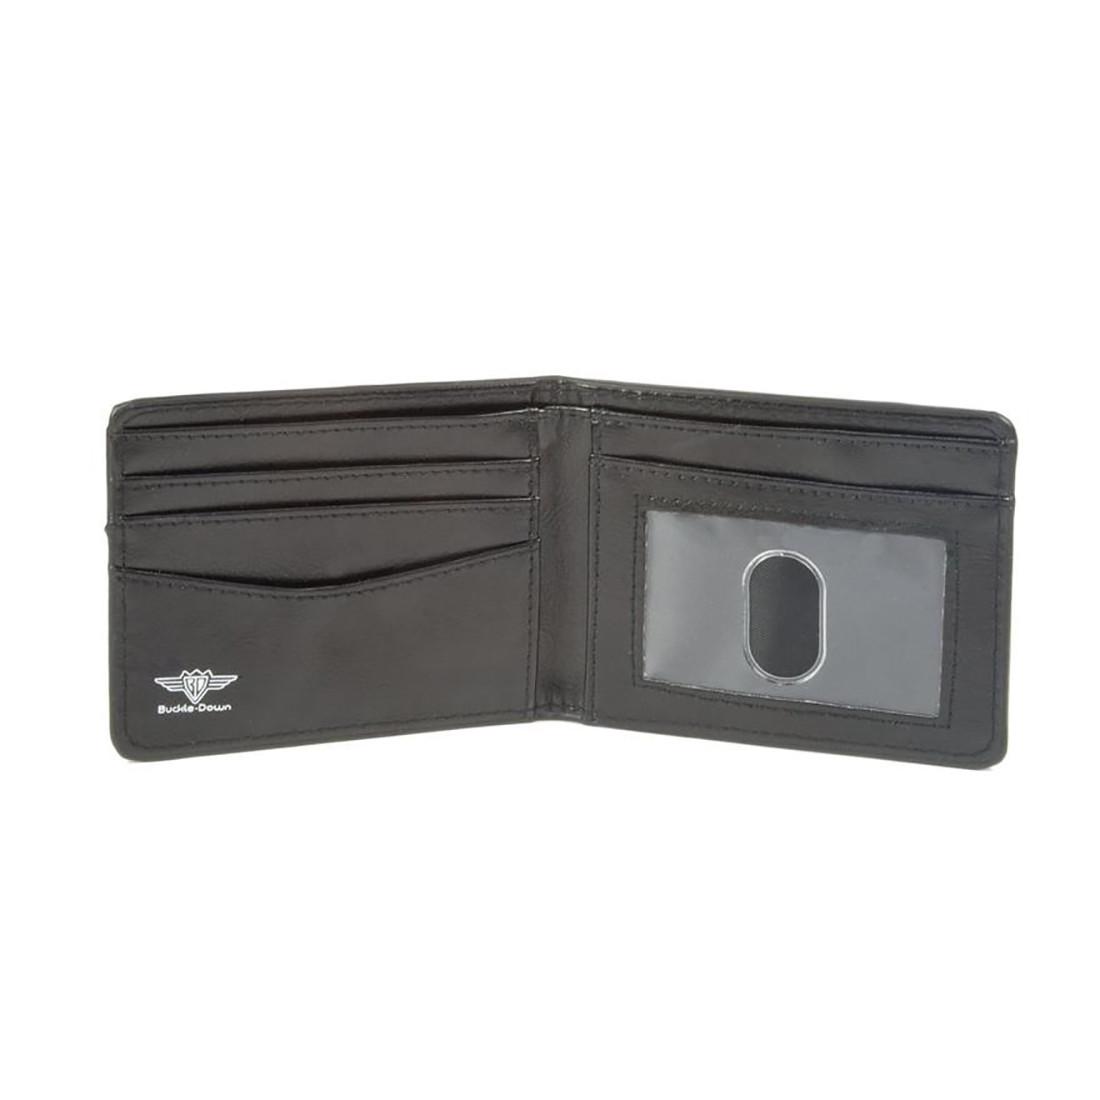 GD Ying Yang Swirl Bi-Fold Wallet